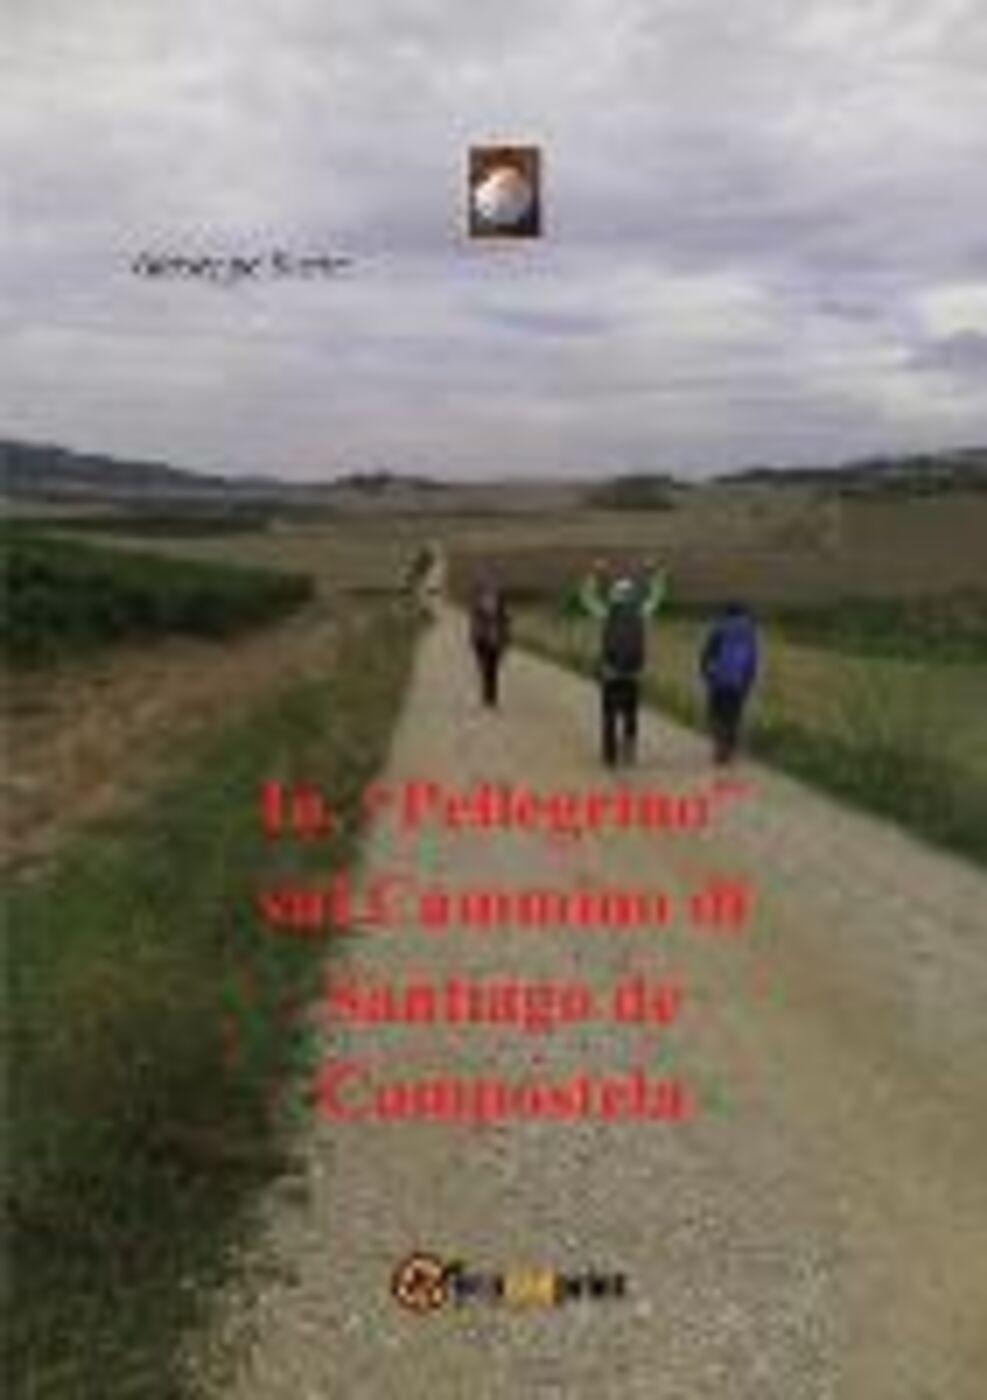 Io, «Pellegrino» sul Cammino di Santiago de Compostela